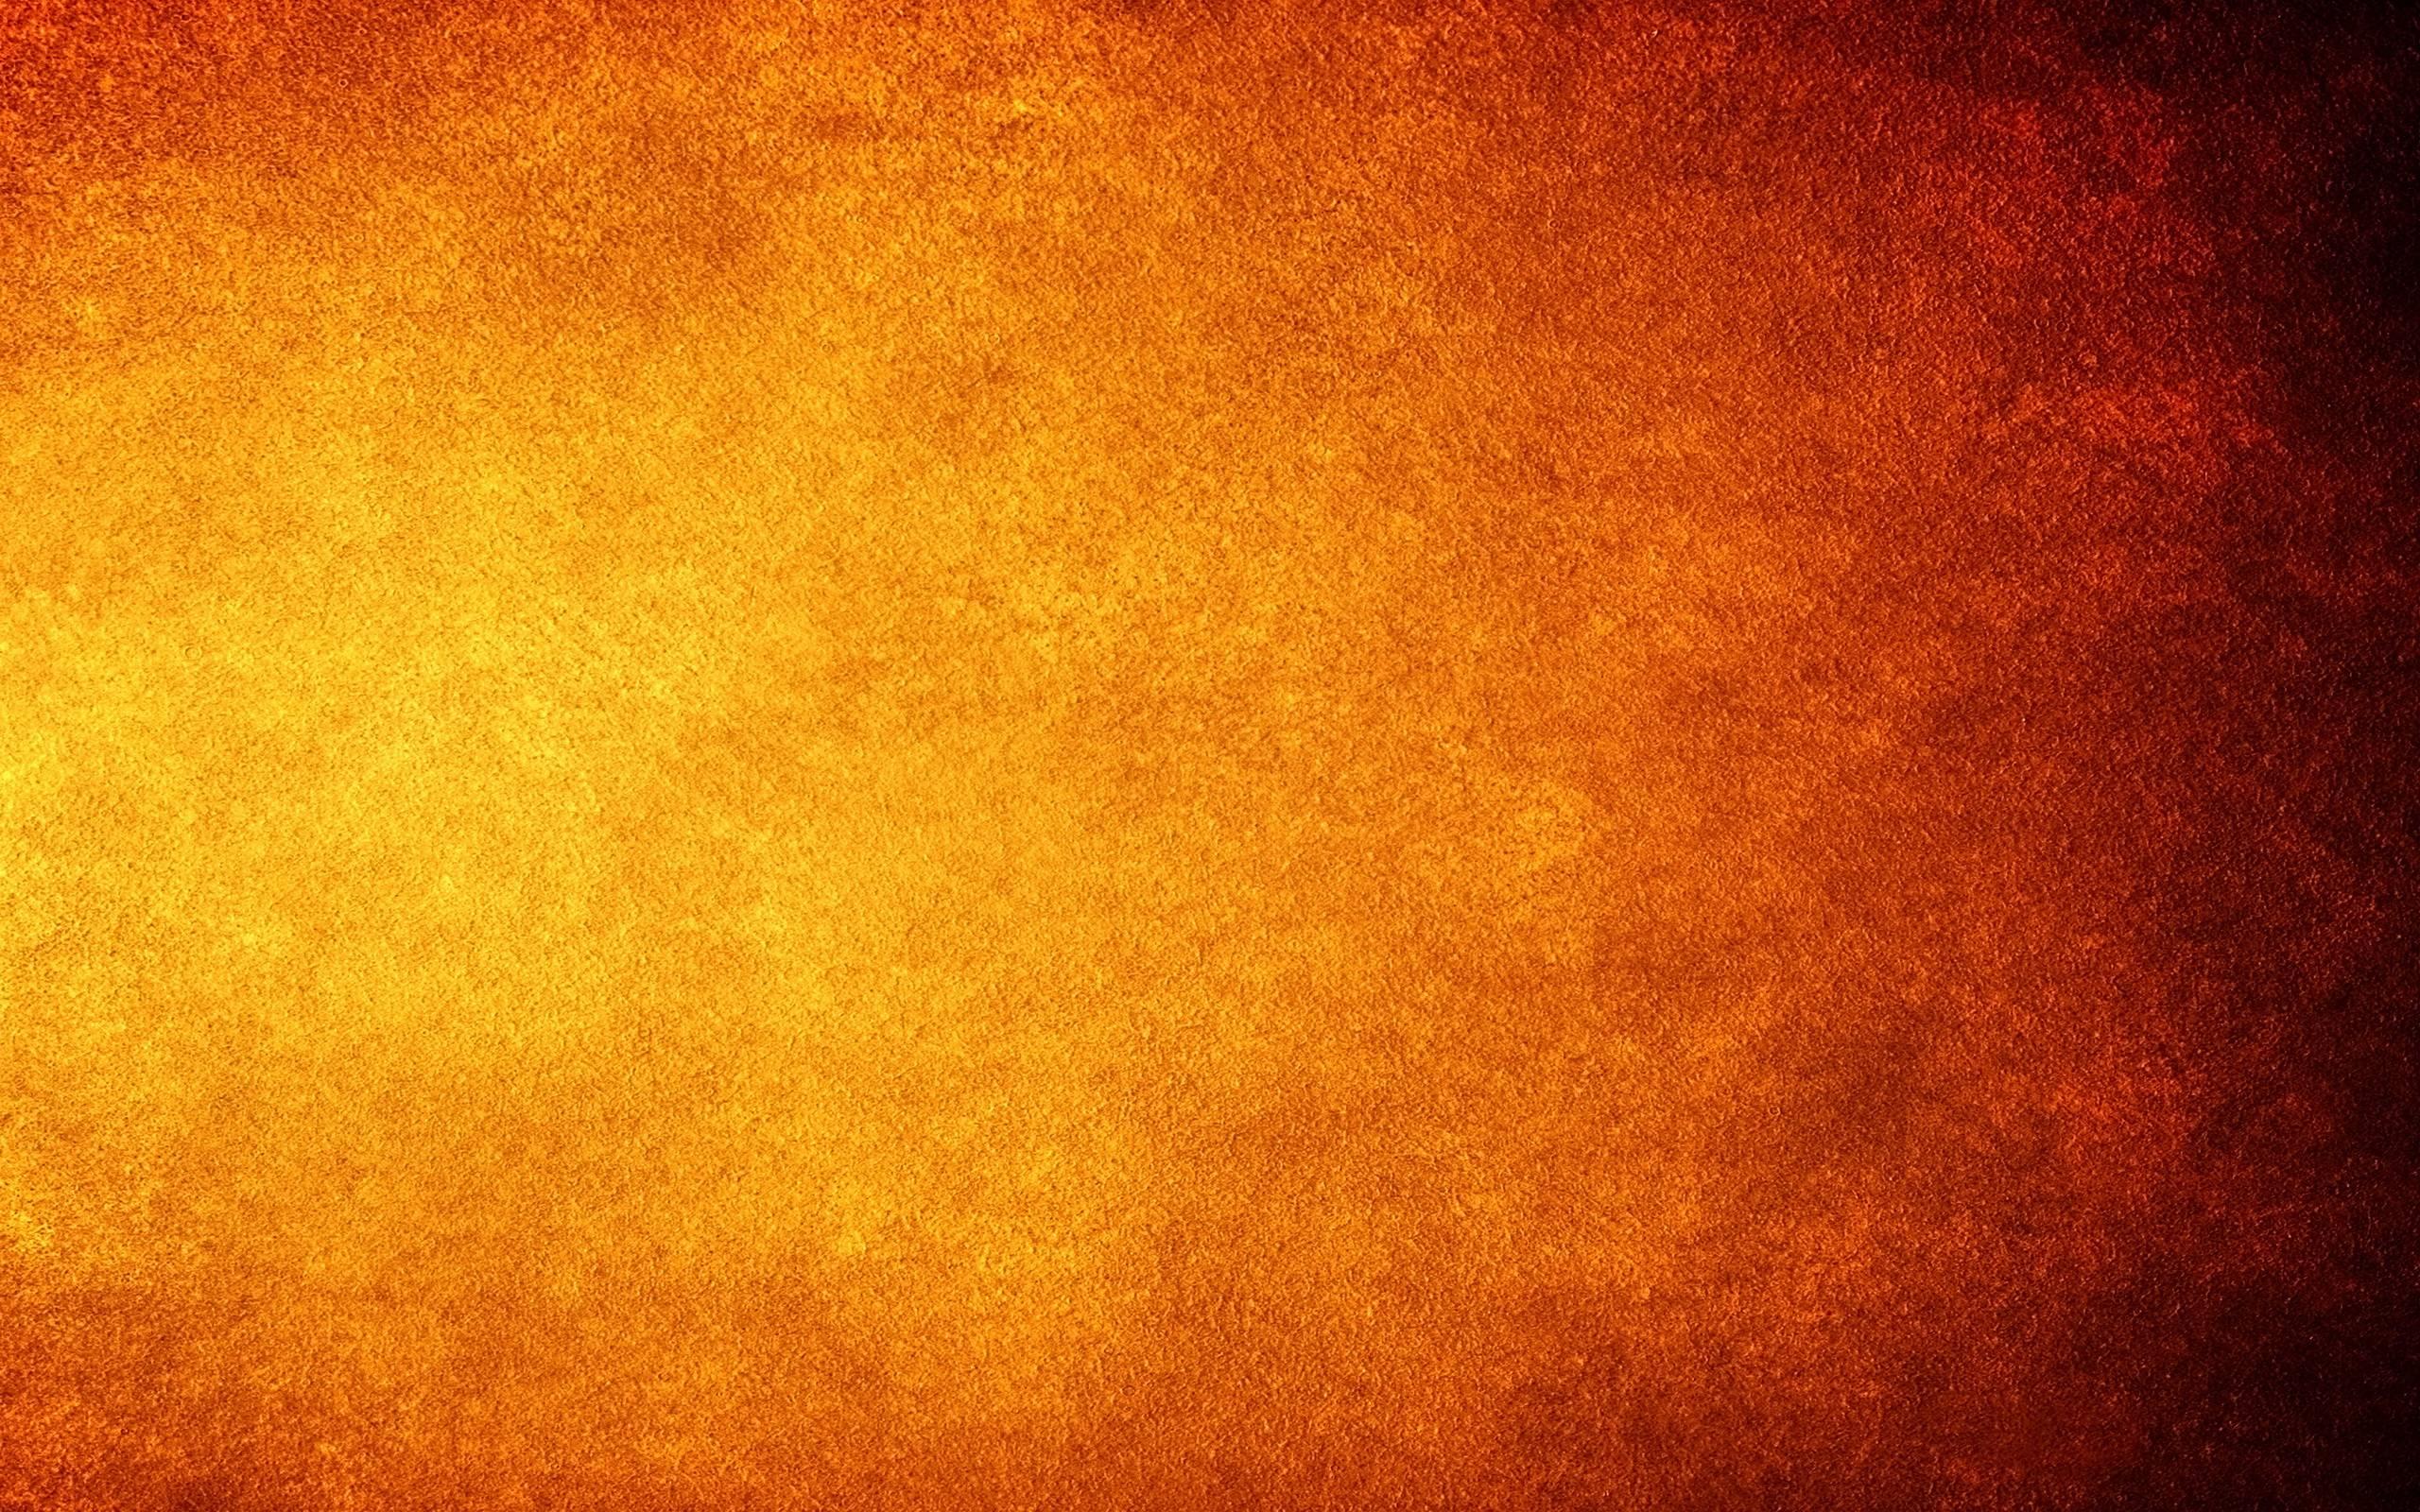 Cool Orange Backgrounds Wallpaper Cave